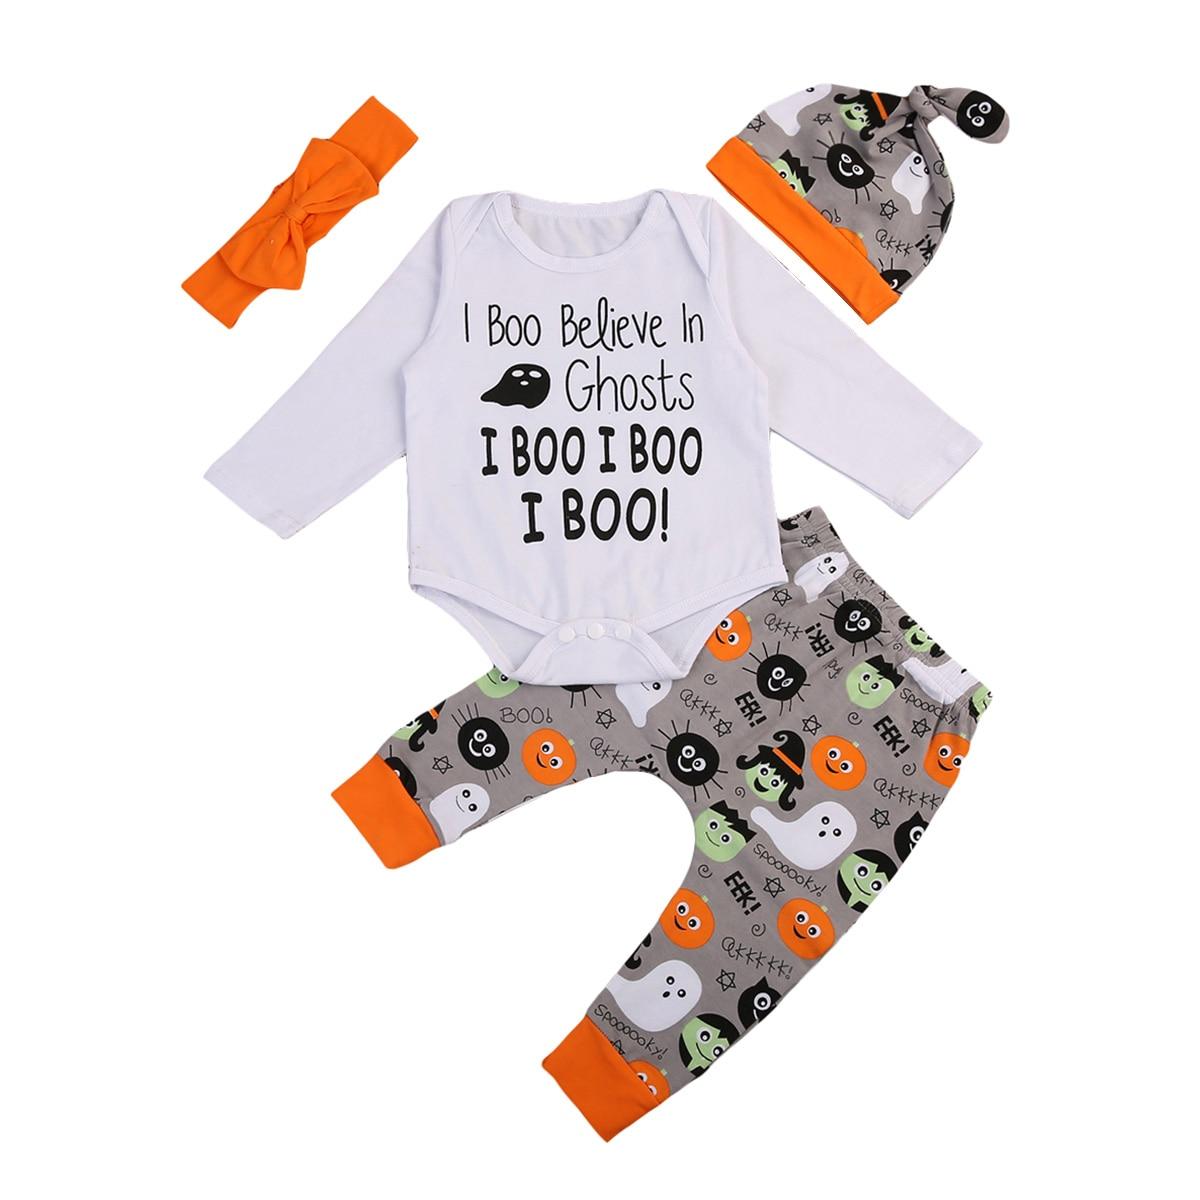 Halloween <font><b>Lovely</b></font> Infant <font><b>Baby</b></font> Girls <font><b>Boo</b></font> Letter Outfit Clothes Cotton Romper tops +Long Pumpkin Pants Set